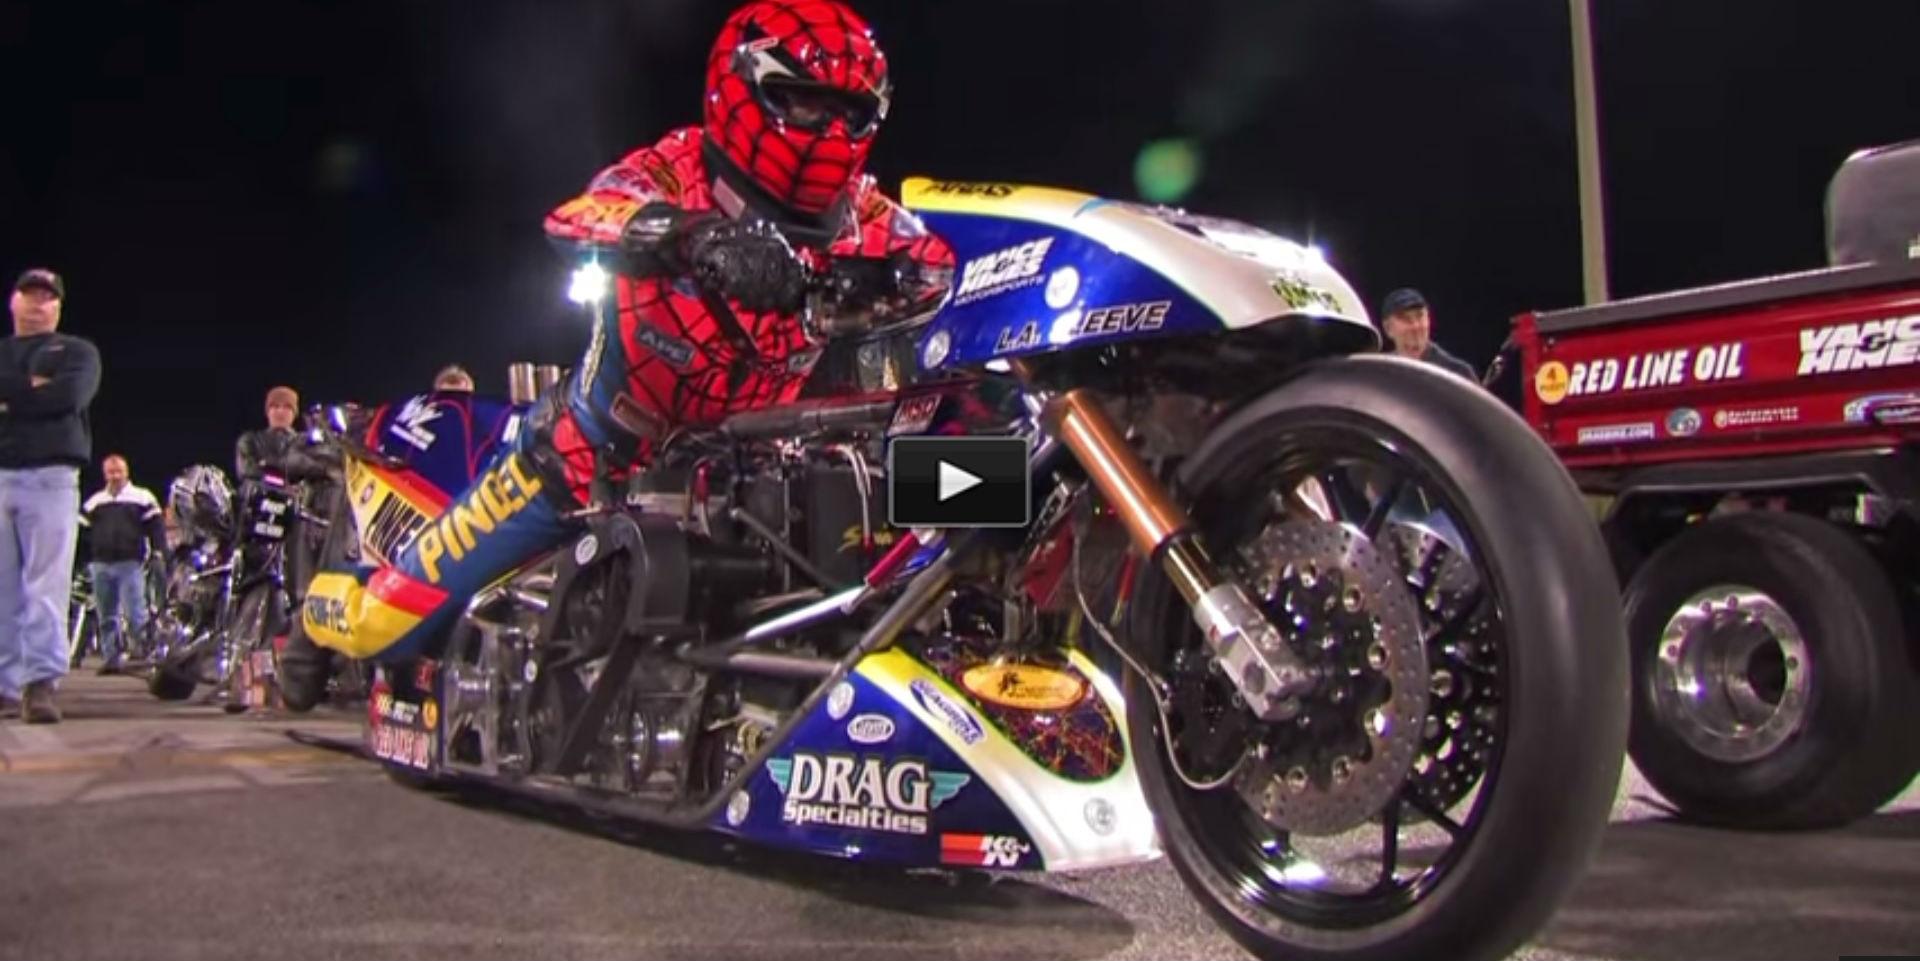 Ultimate Bike Drag Race Top Fuel Nitro Vs Top Fuel Harley